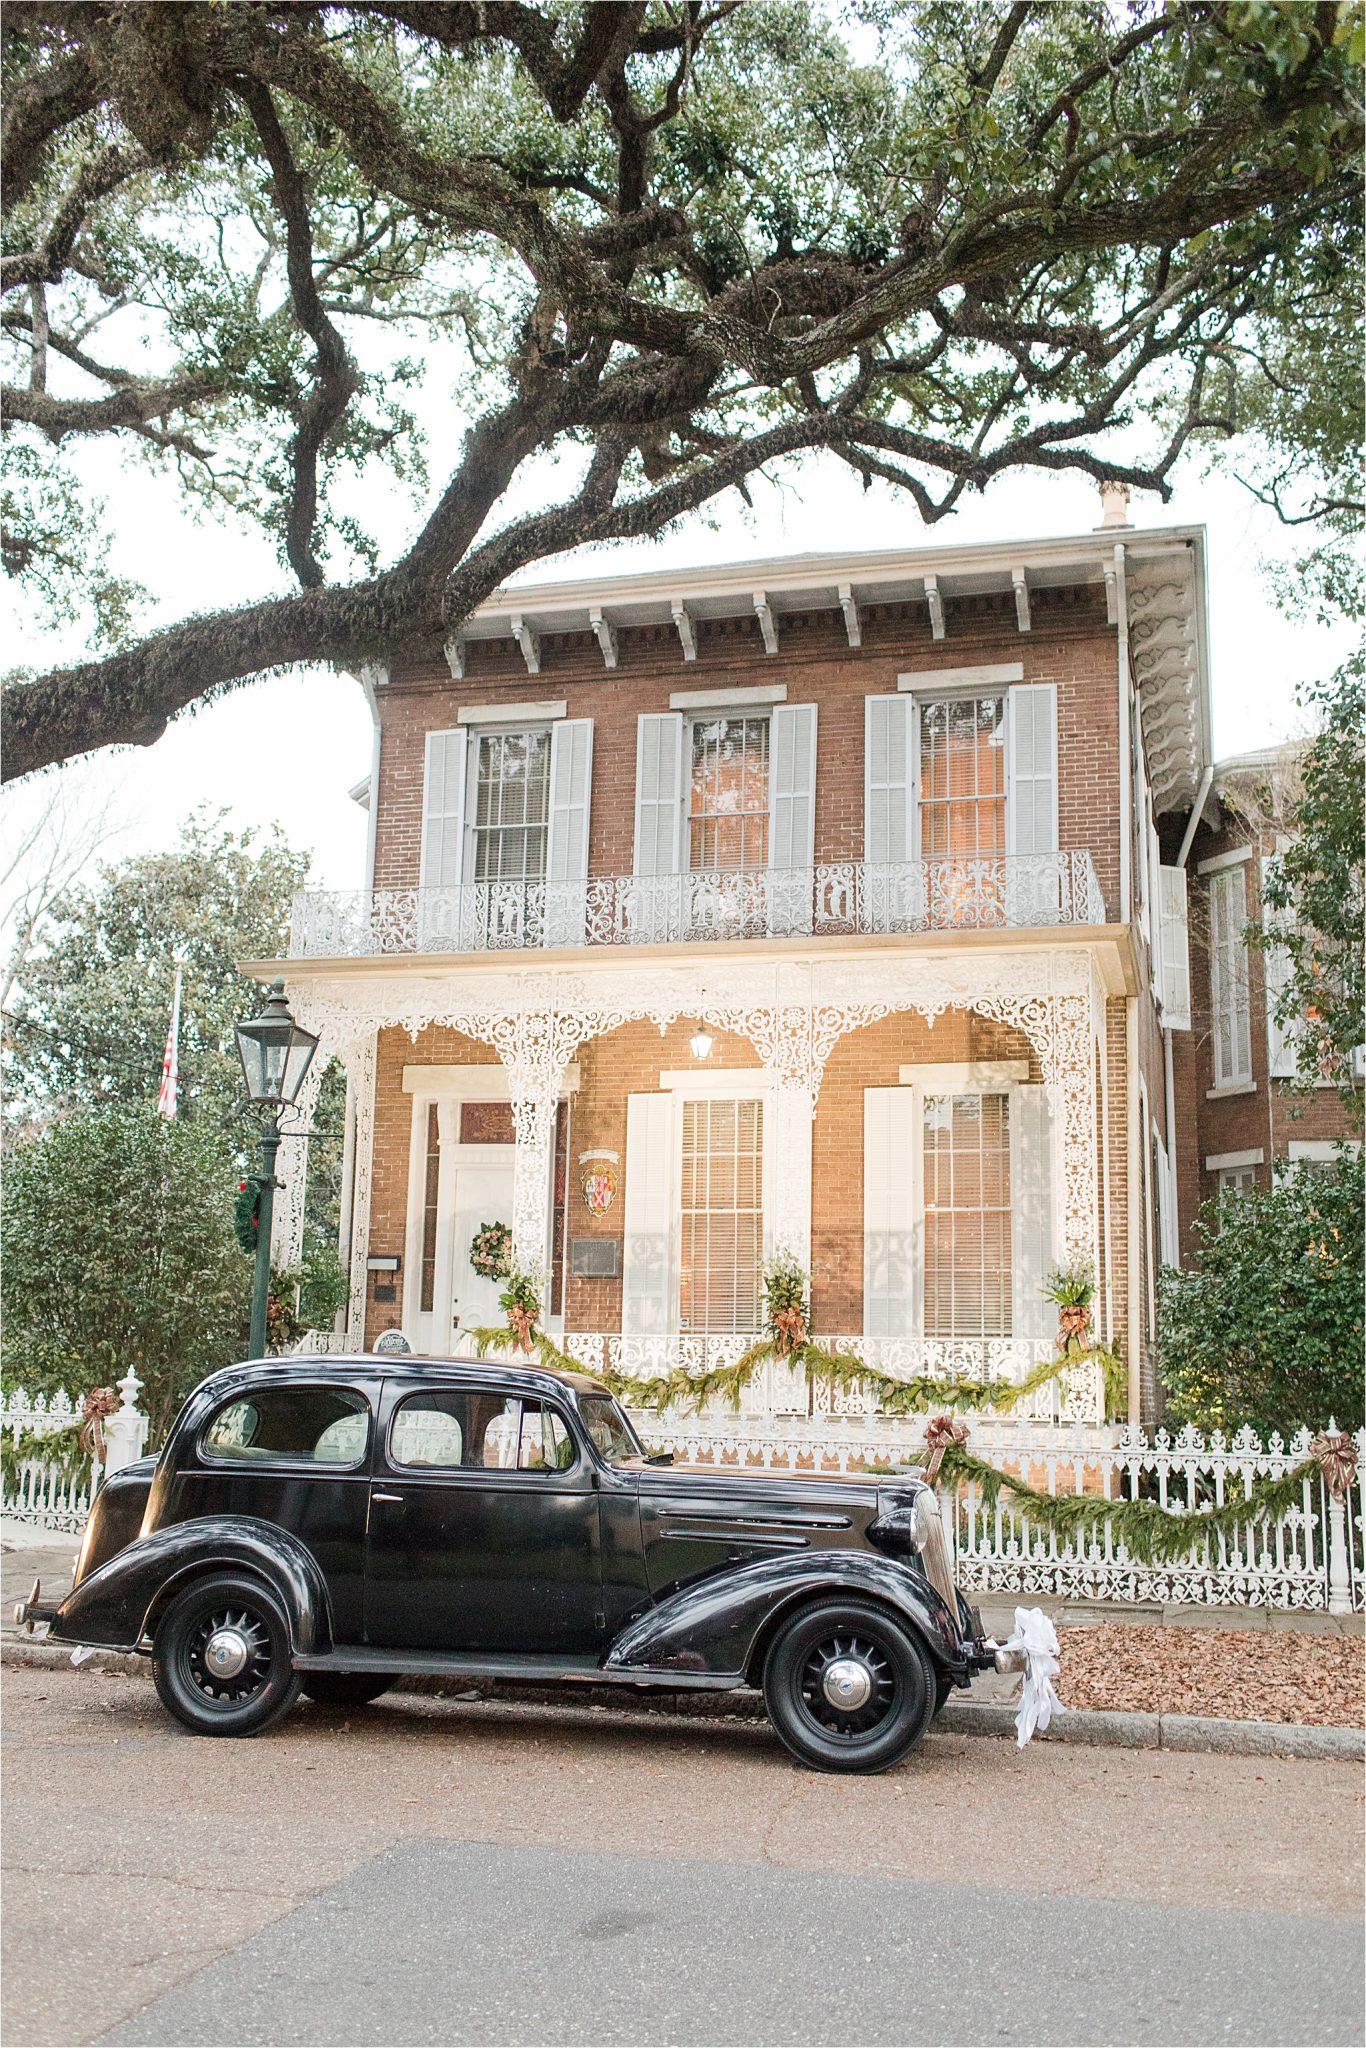 Richards DAR house-downtown-mobile-antique-vintage-car-wedding-reception-venue-alabama-mobile-wedding-photographer